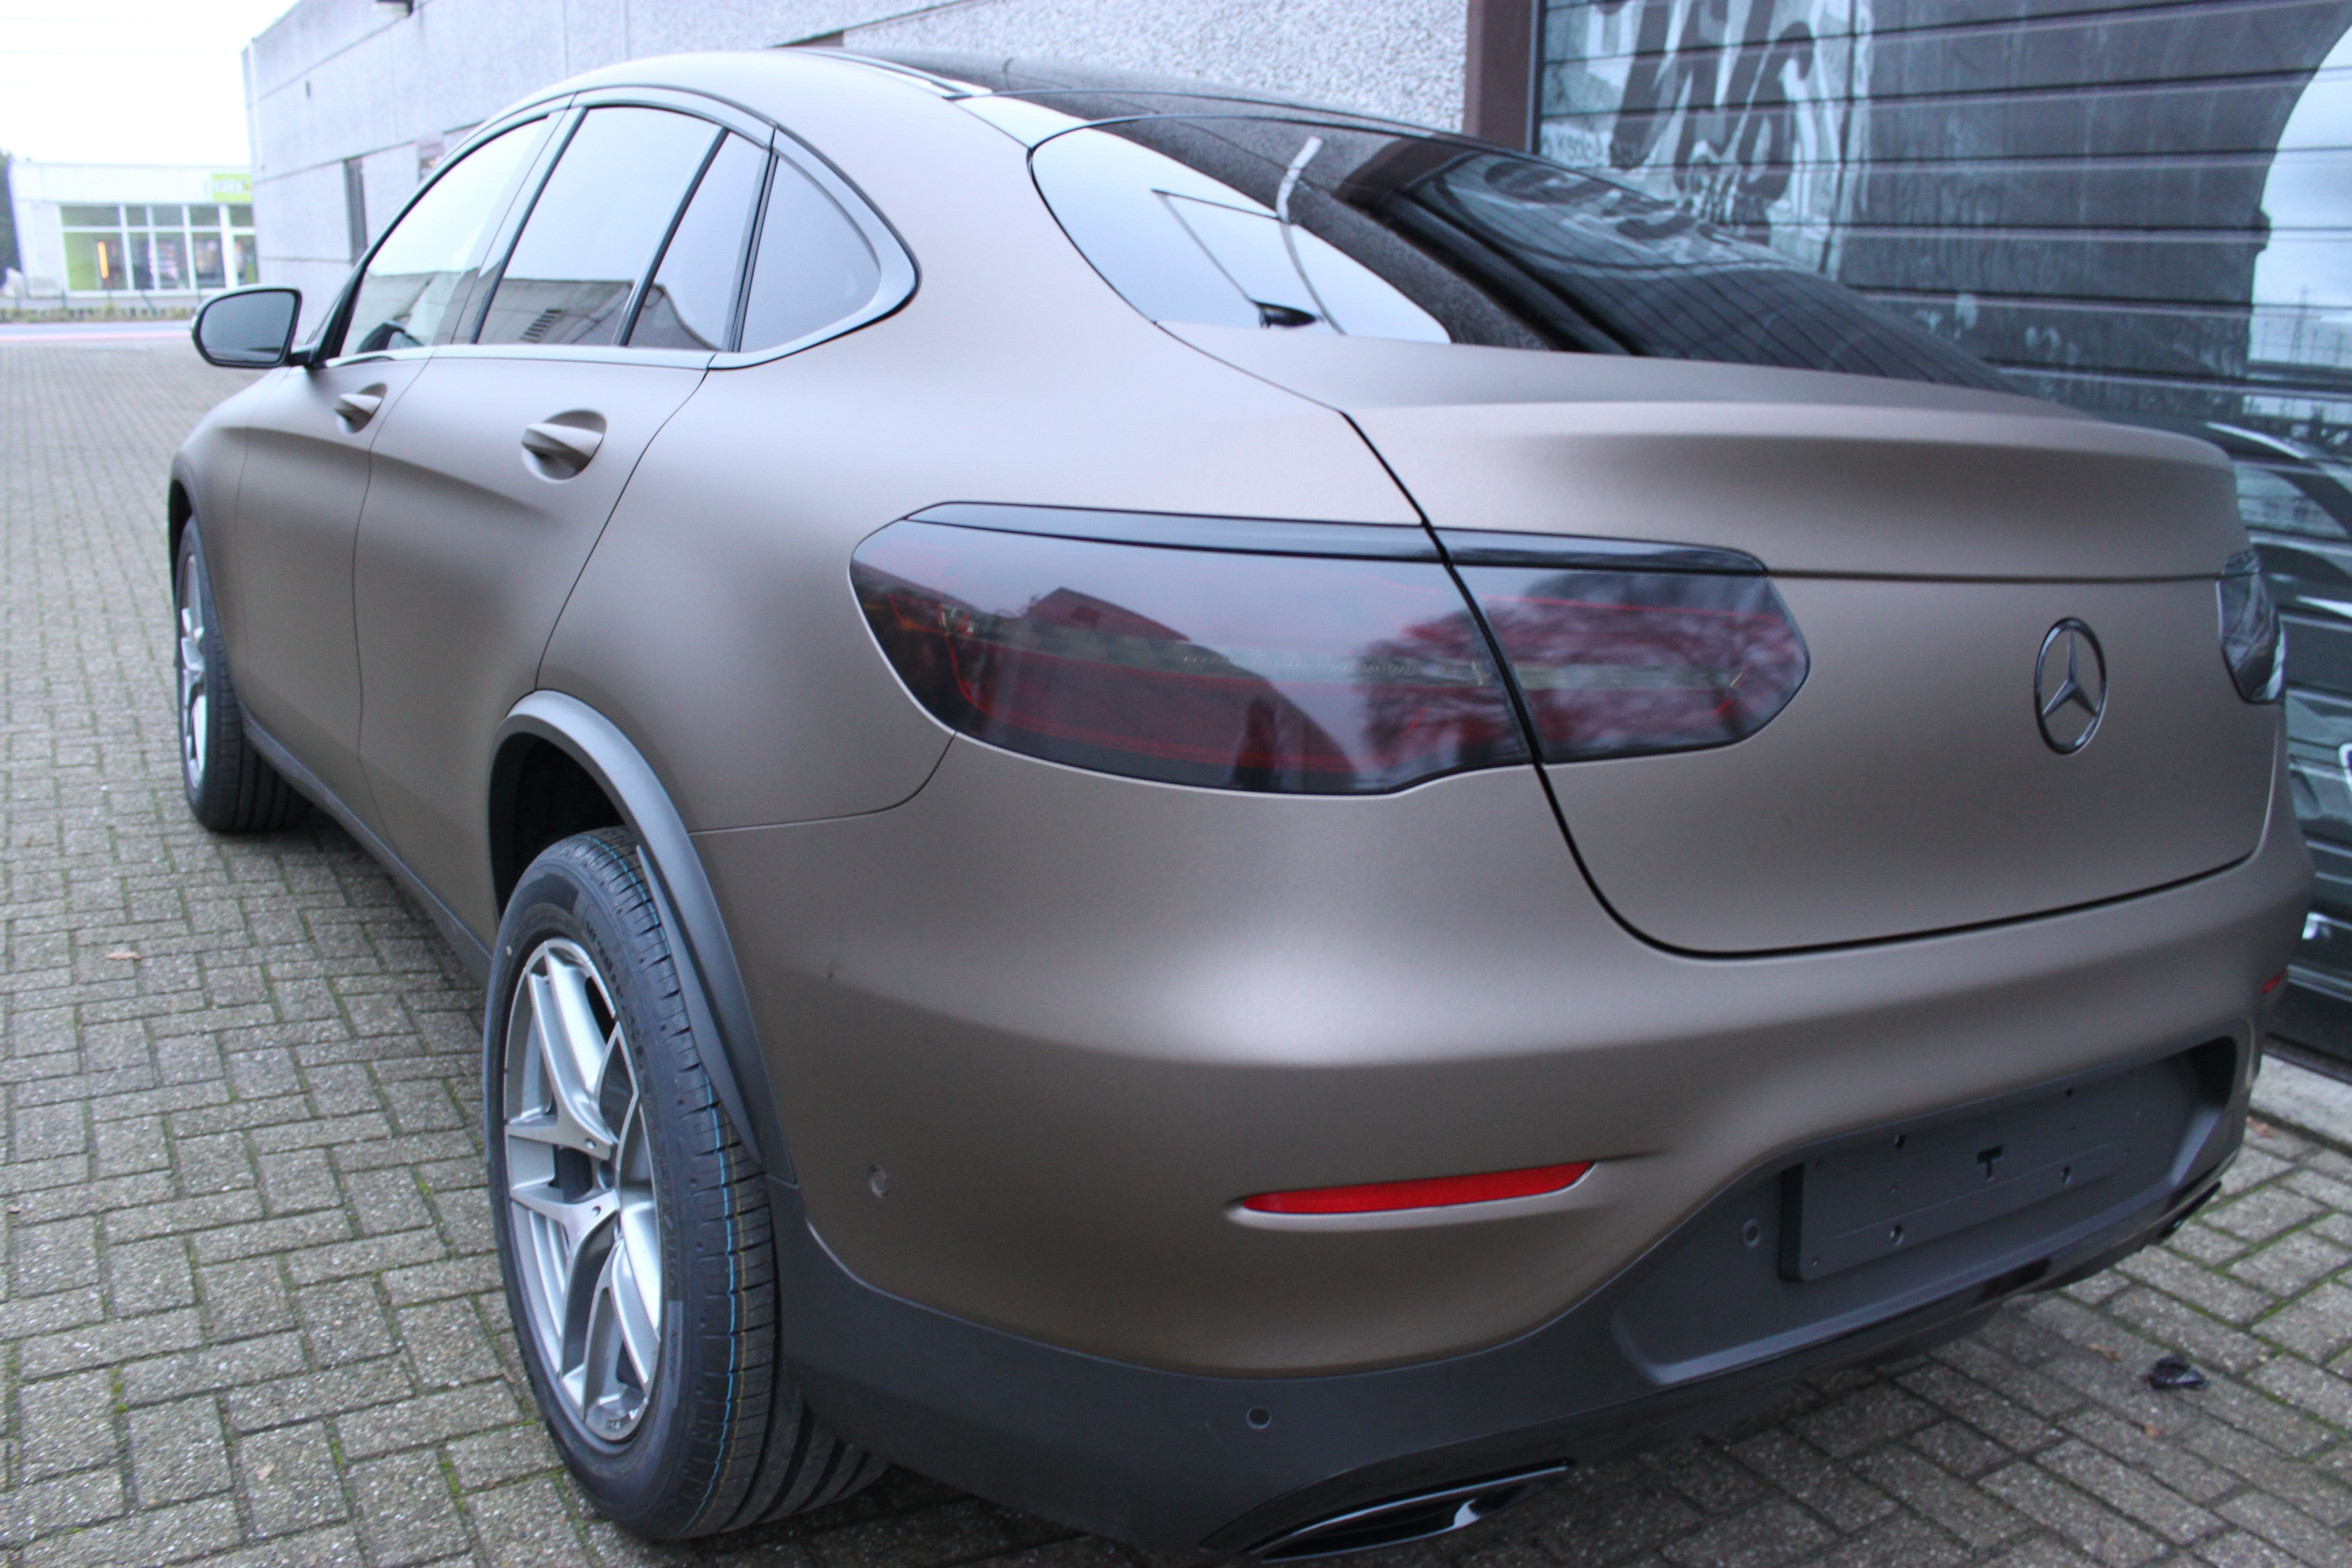 Mercedes GLC Coupe Matte metallic brown, Carwrapping door Wrapmyride.nu Foto-nr:9362, ©2021